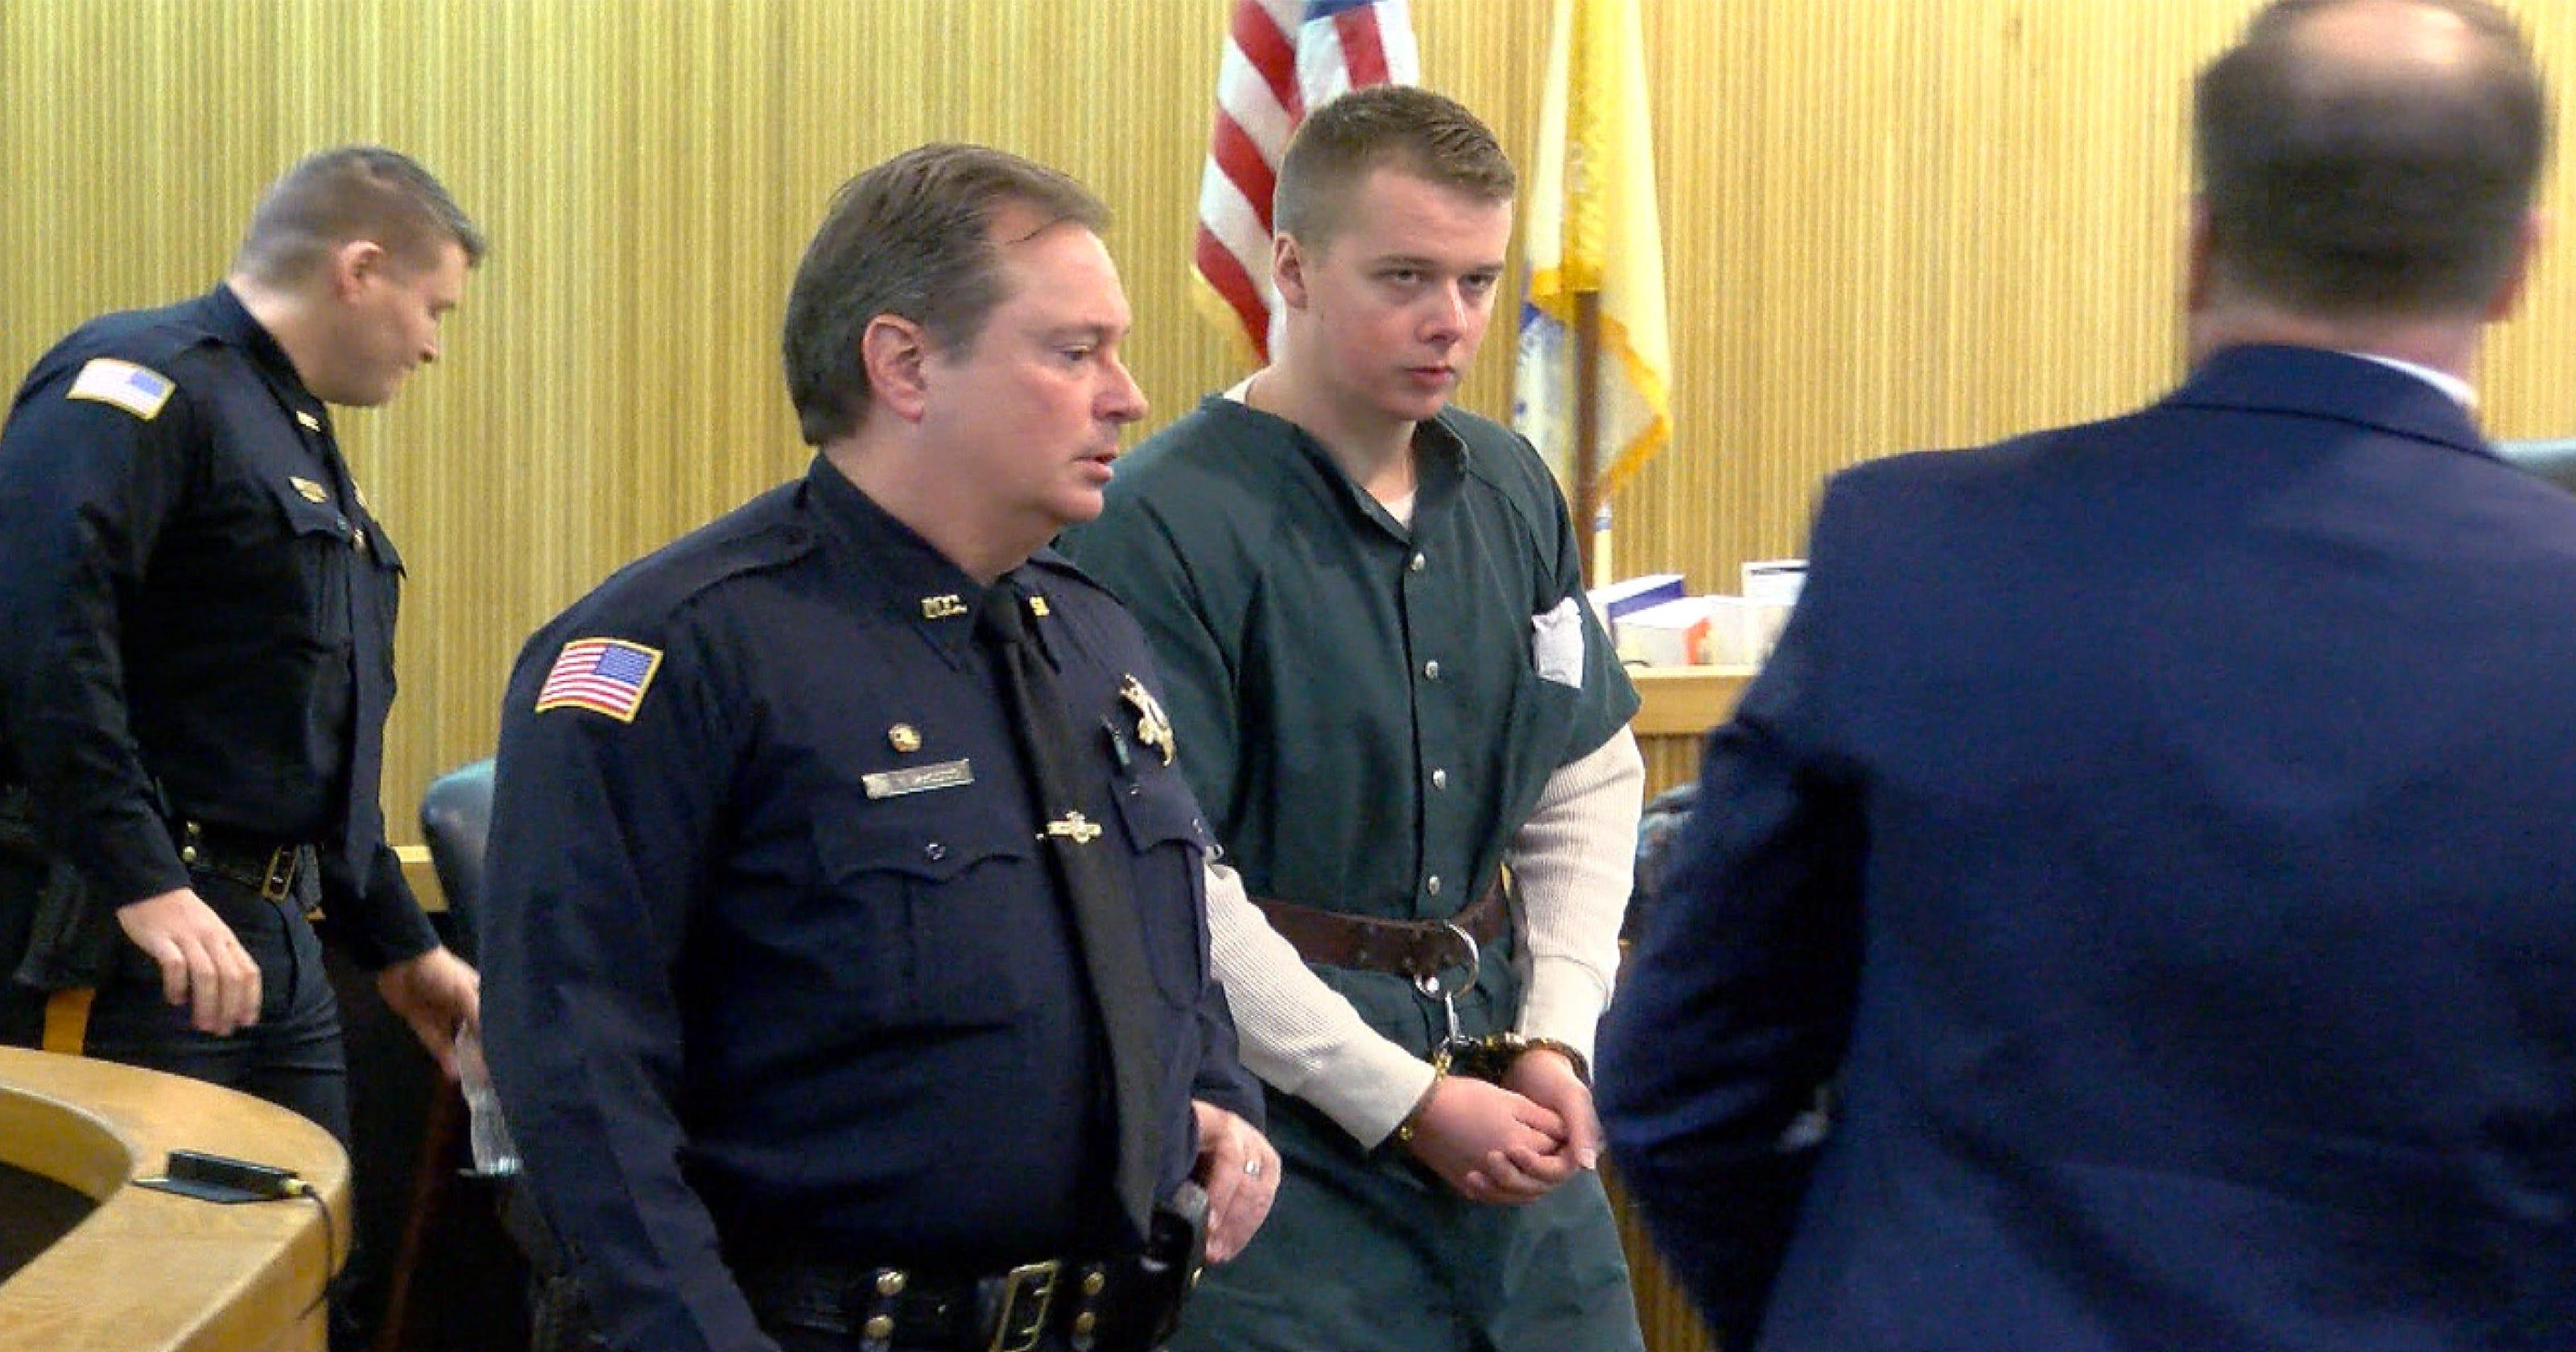 Sarah Stern murder: Attorney says Liam McAtasney 'made up stories'